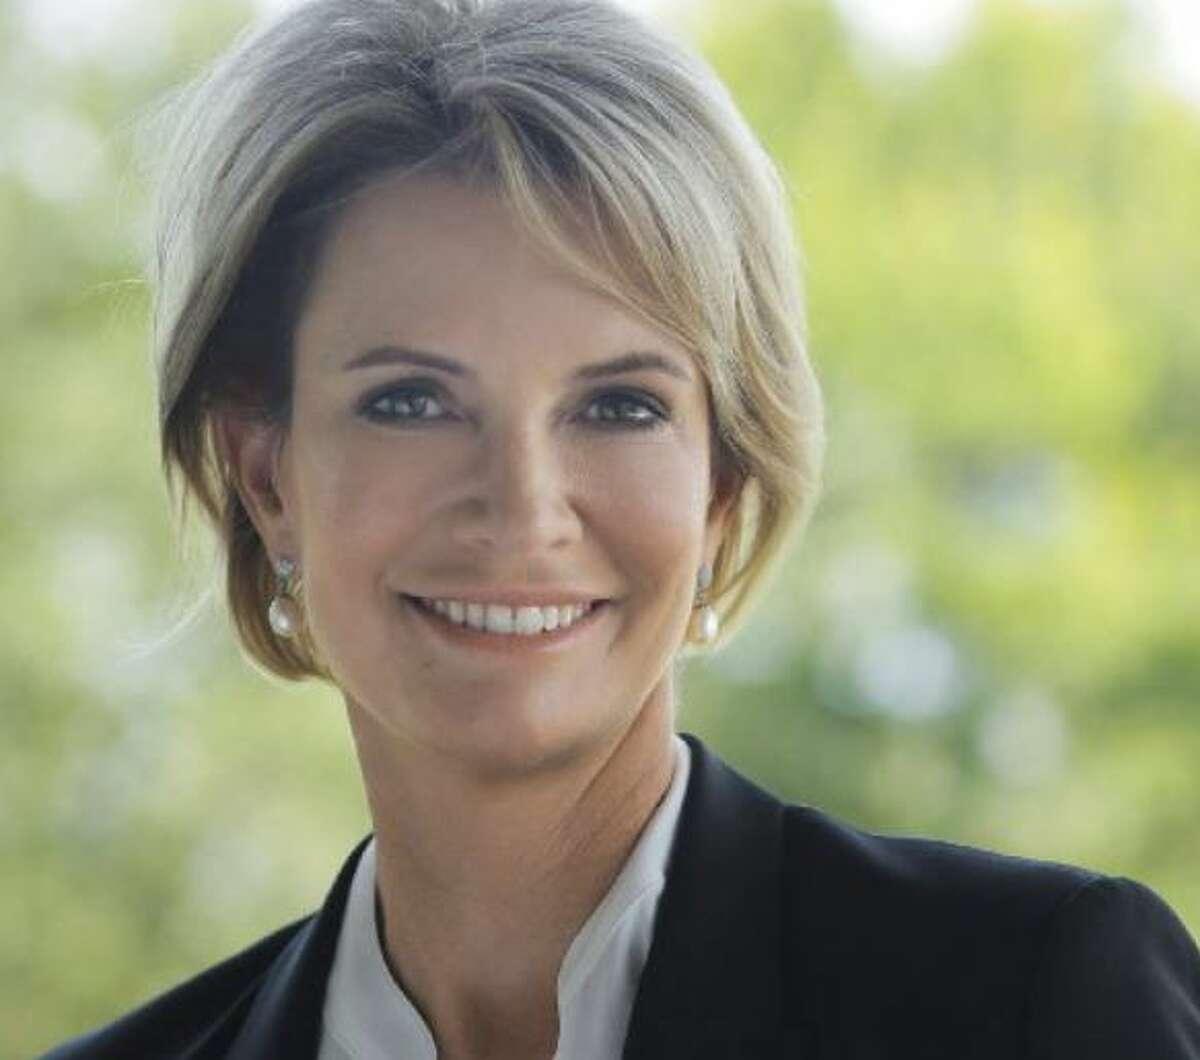 State Sen. Dawn Buckingham, courtesy photo, 2016.